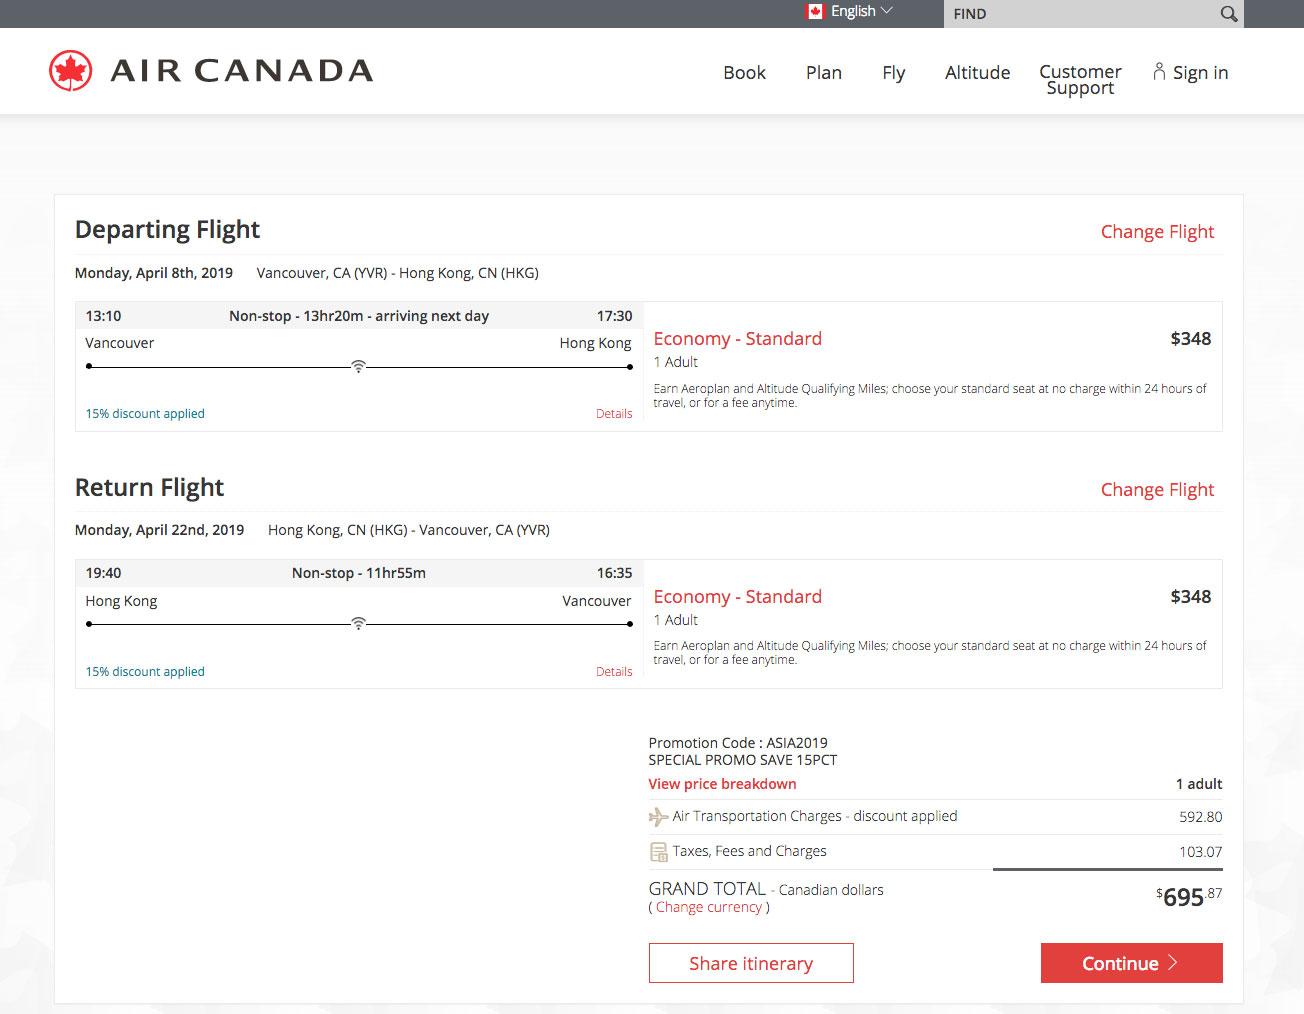 Air Canada:亚洲城市八五折限时优惠